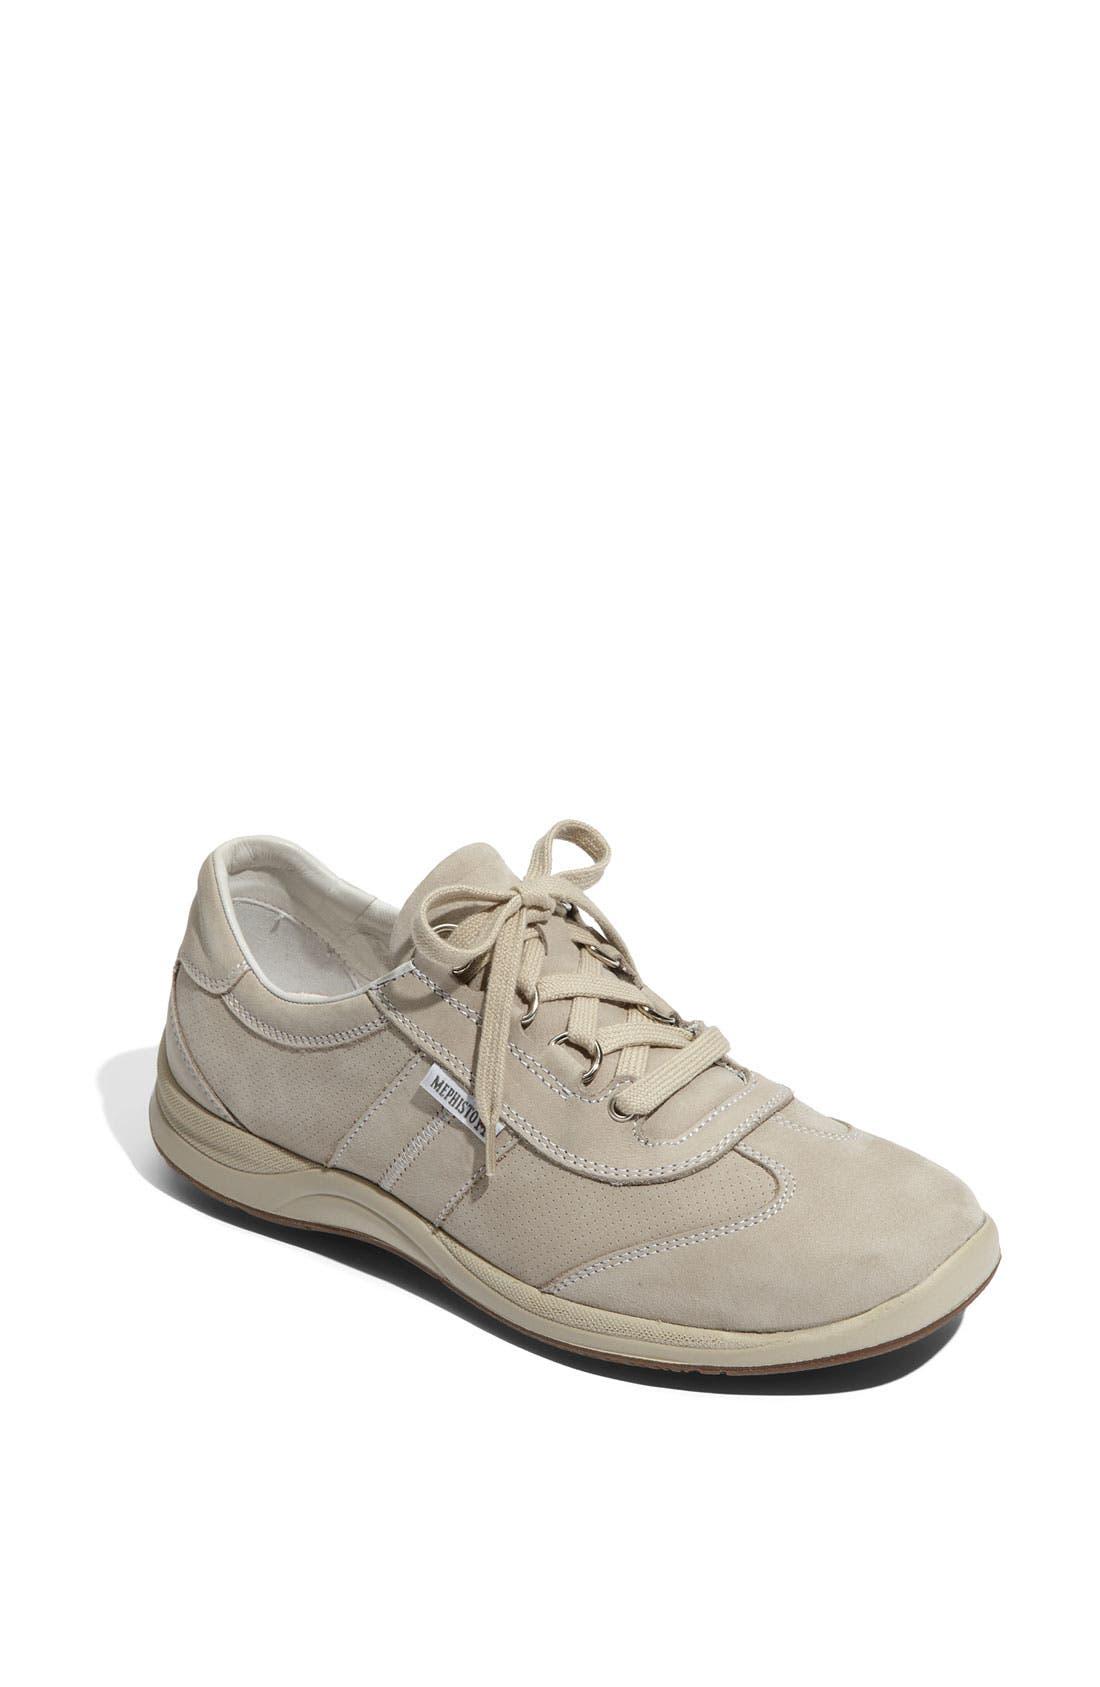 Alternate Image 1 Selected - Mephisto Perforated Walking Shoe (Women)